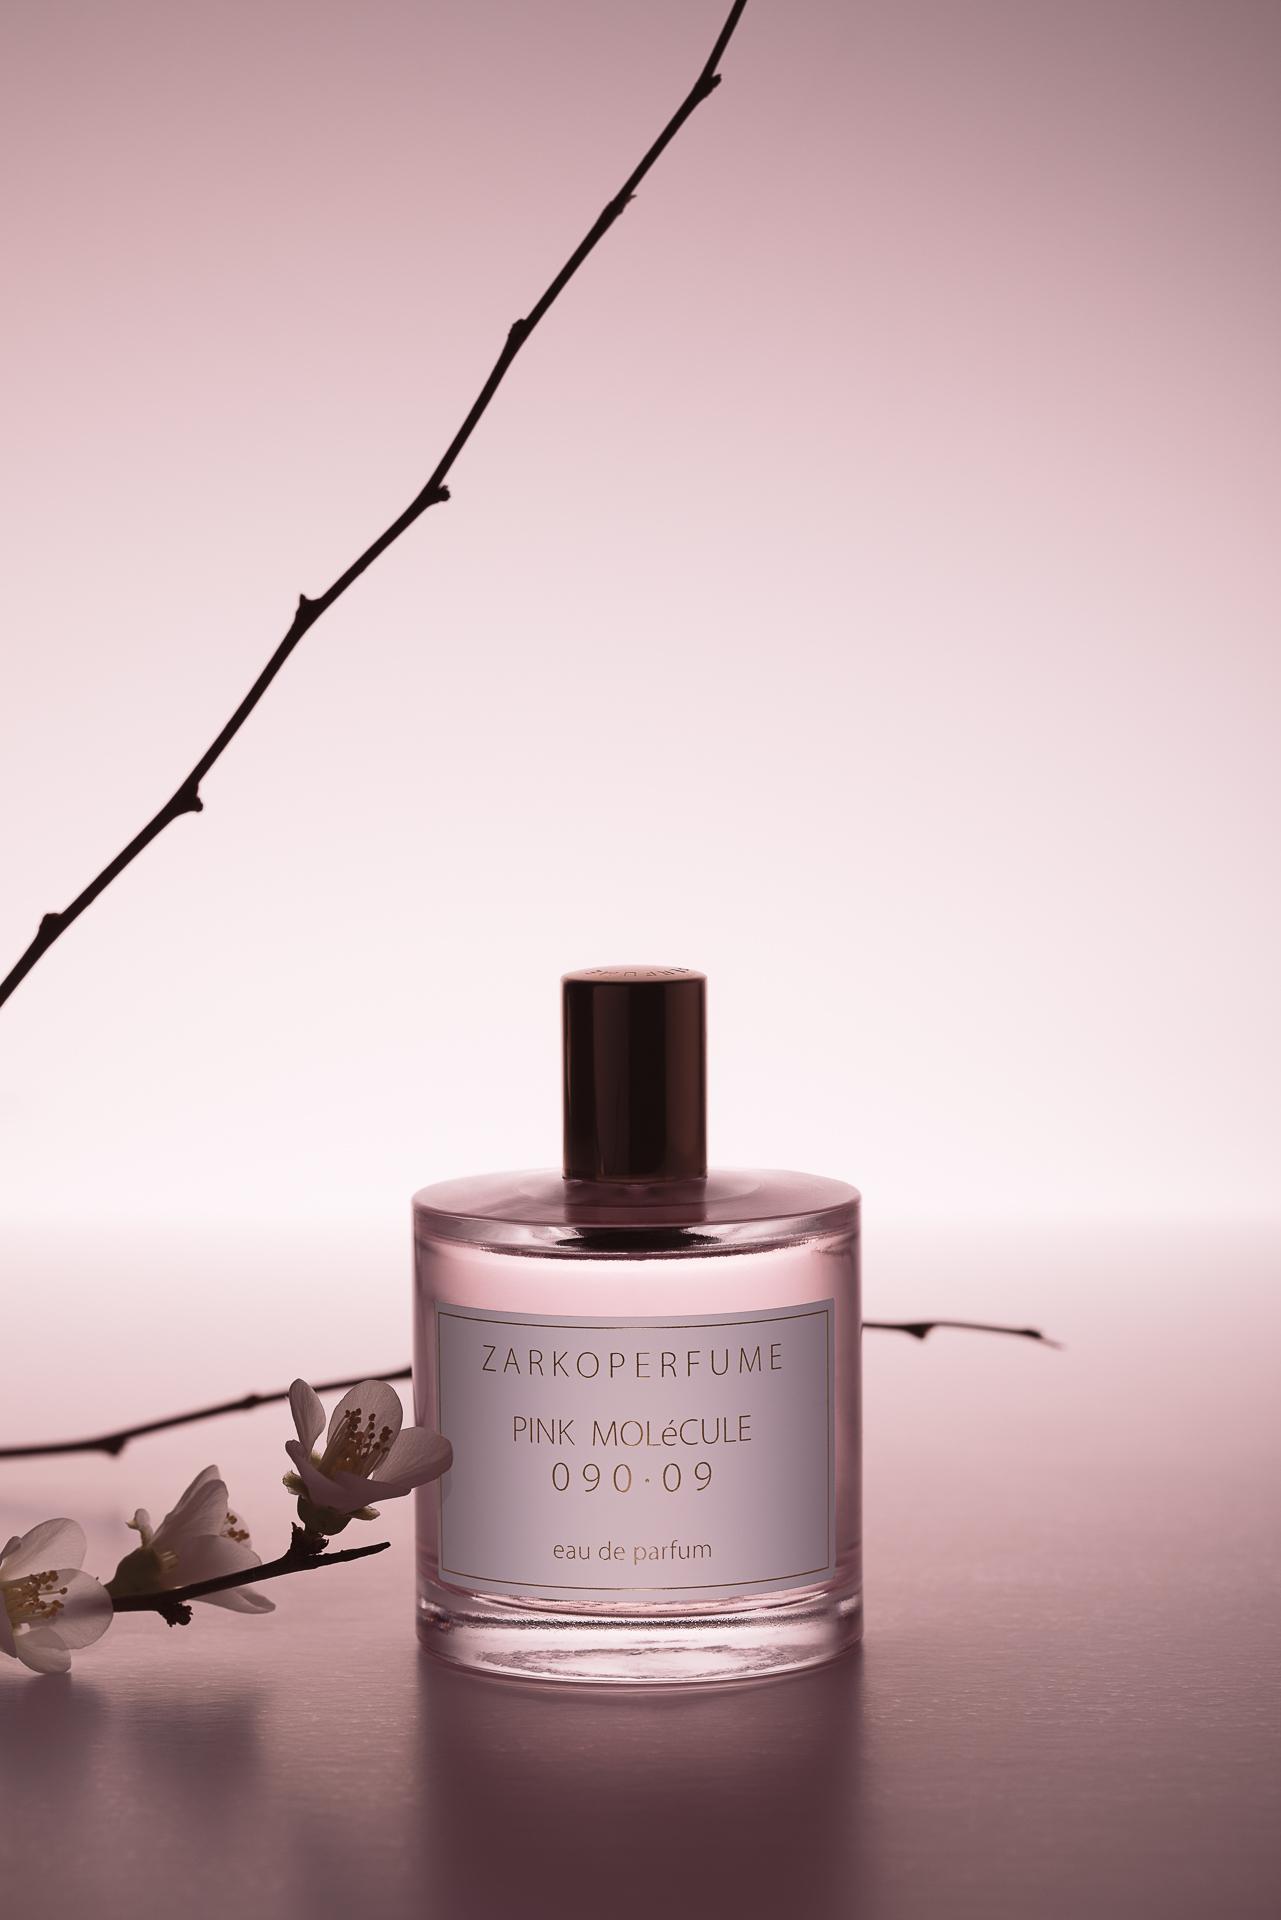 Pink Molécule - Zarkoperfume Fragrance Sundown